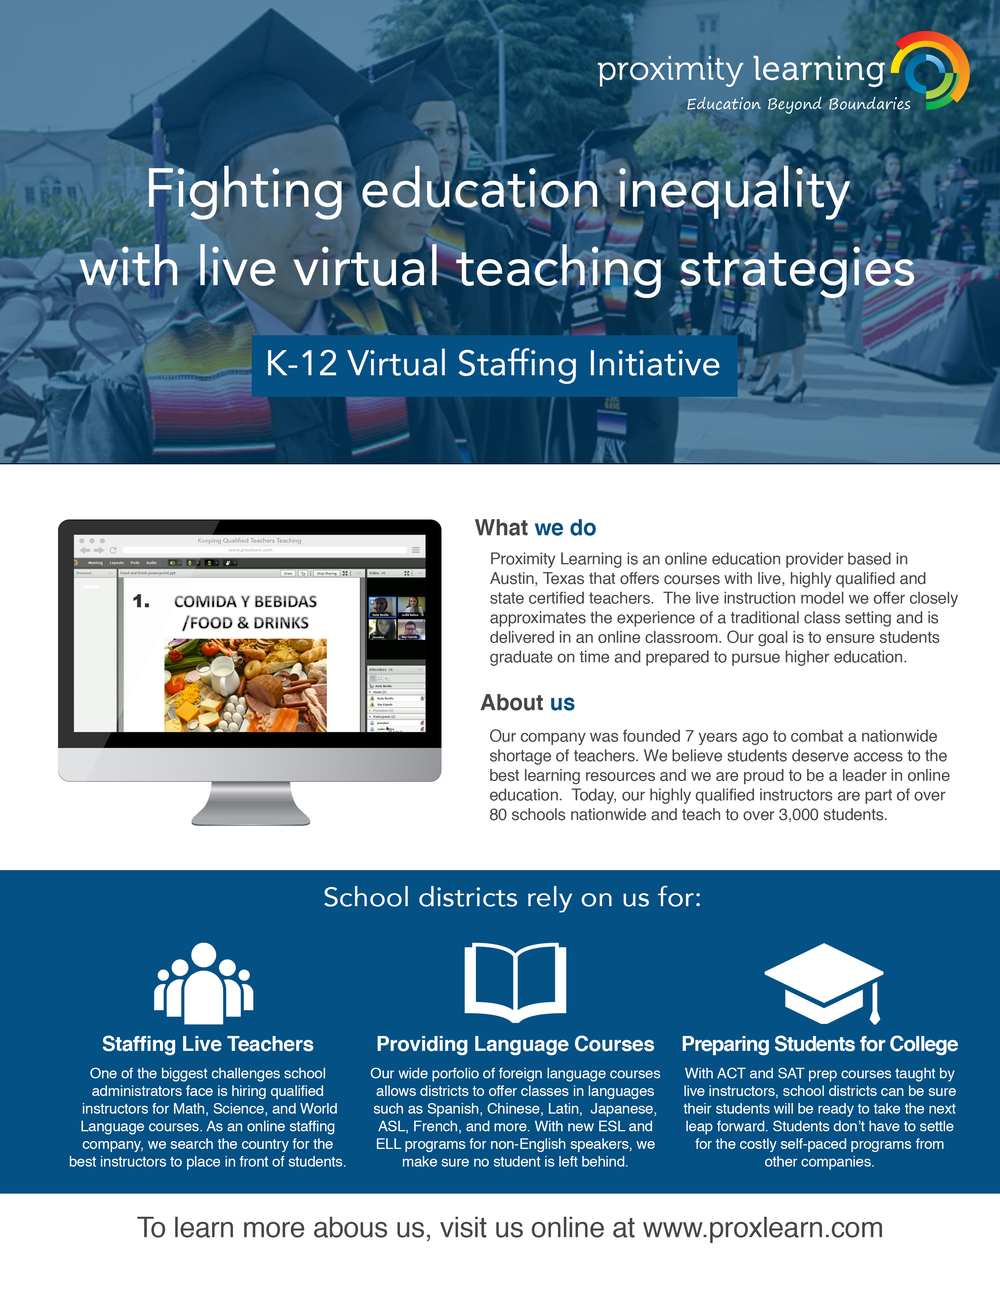 K-12 Virtual Staffing Initiative – ESL/College